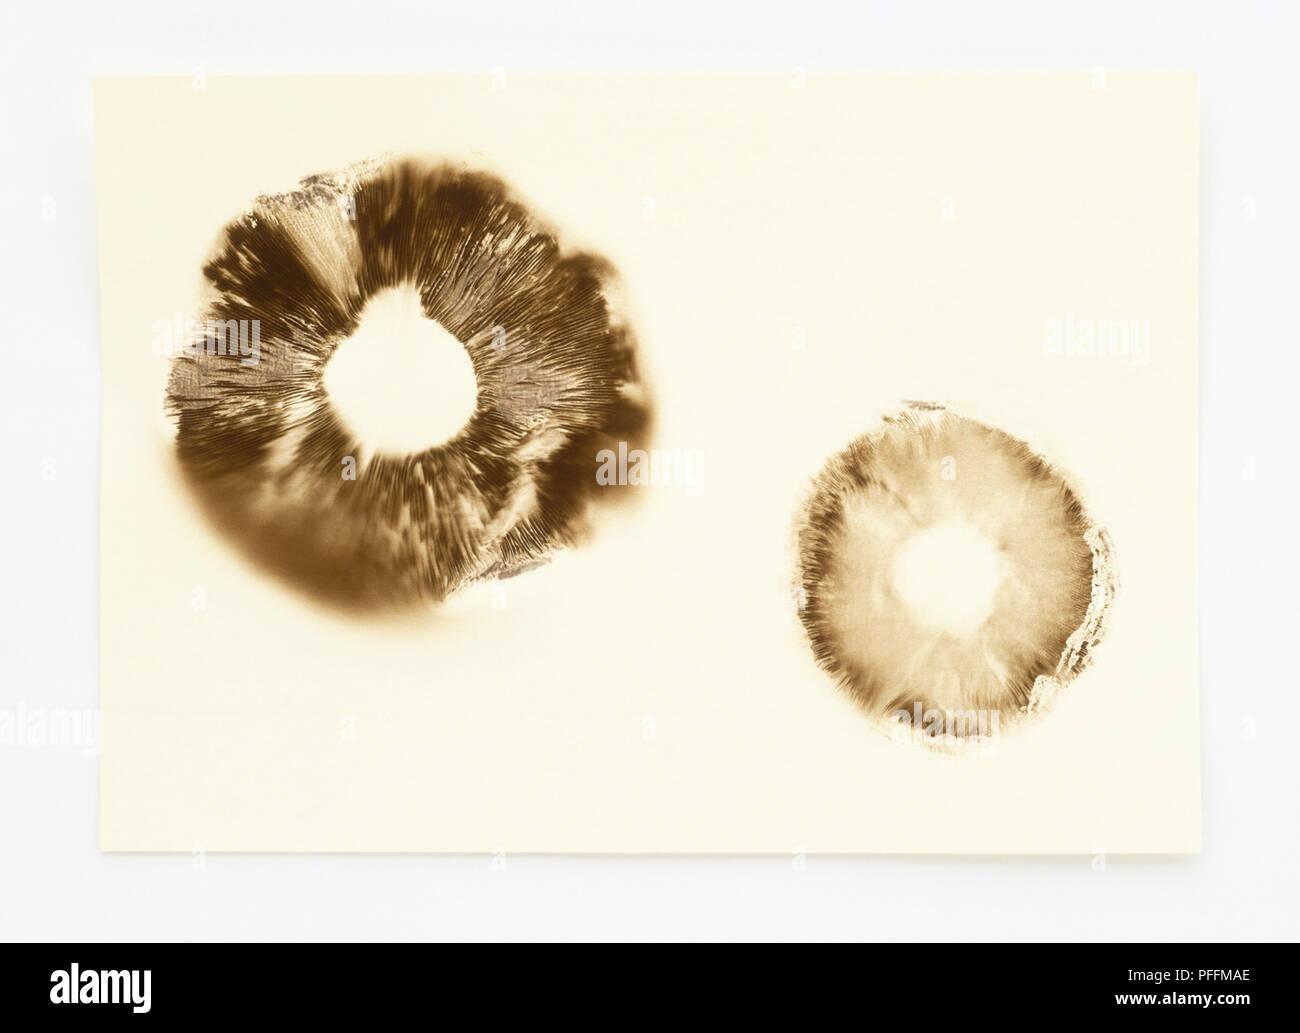 Mushroom Spores Printed On Paper Stock Photo 216089510 Alamy